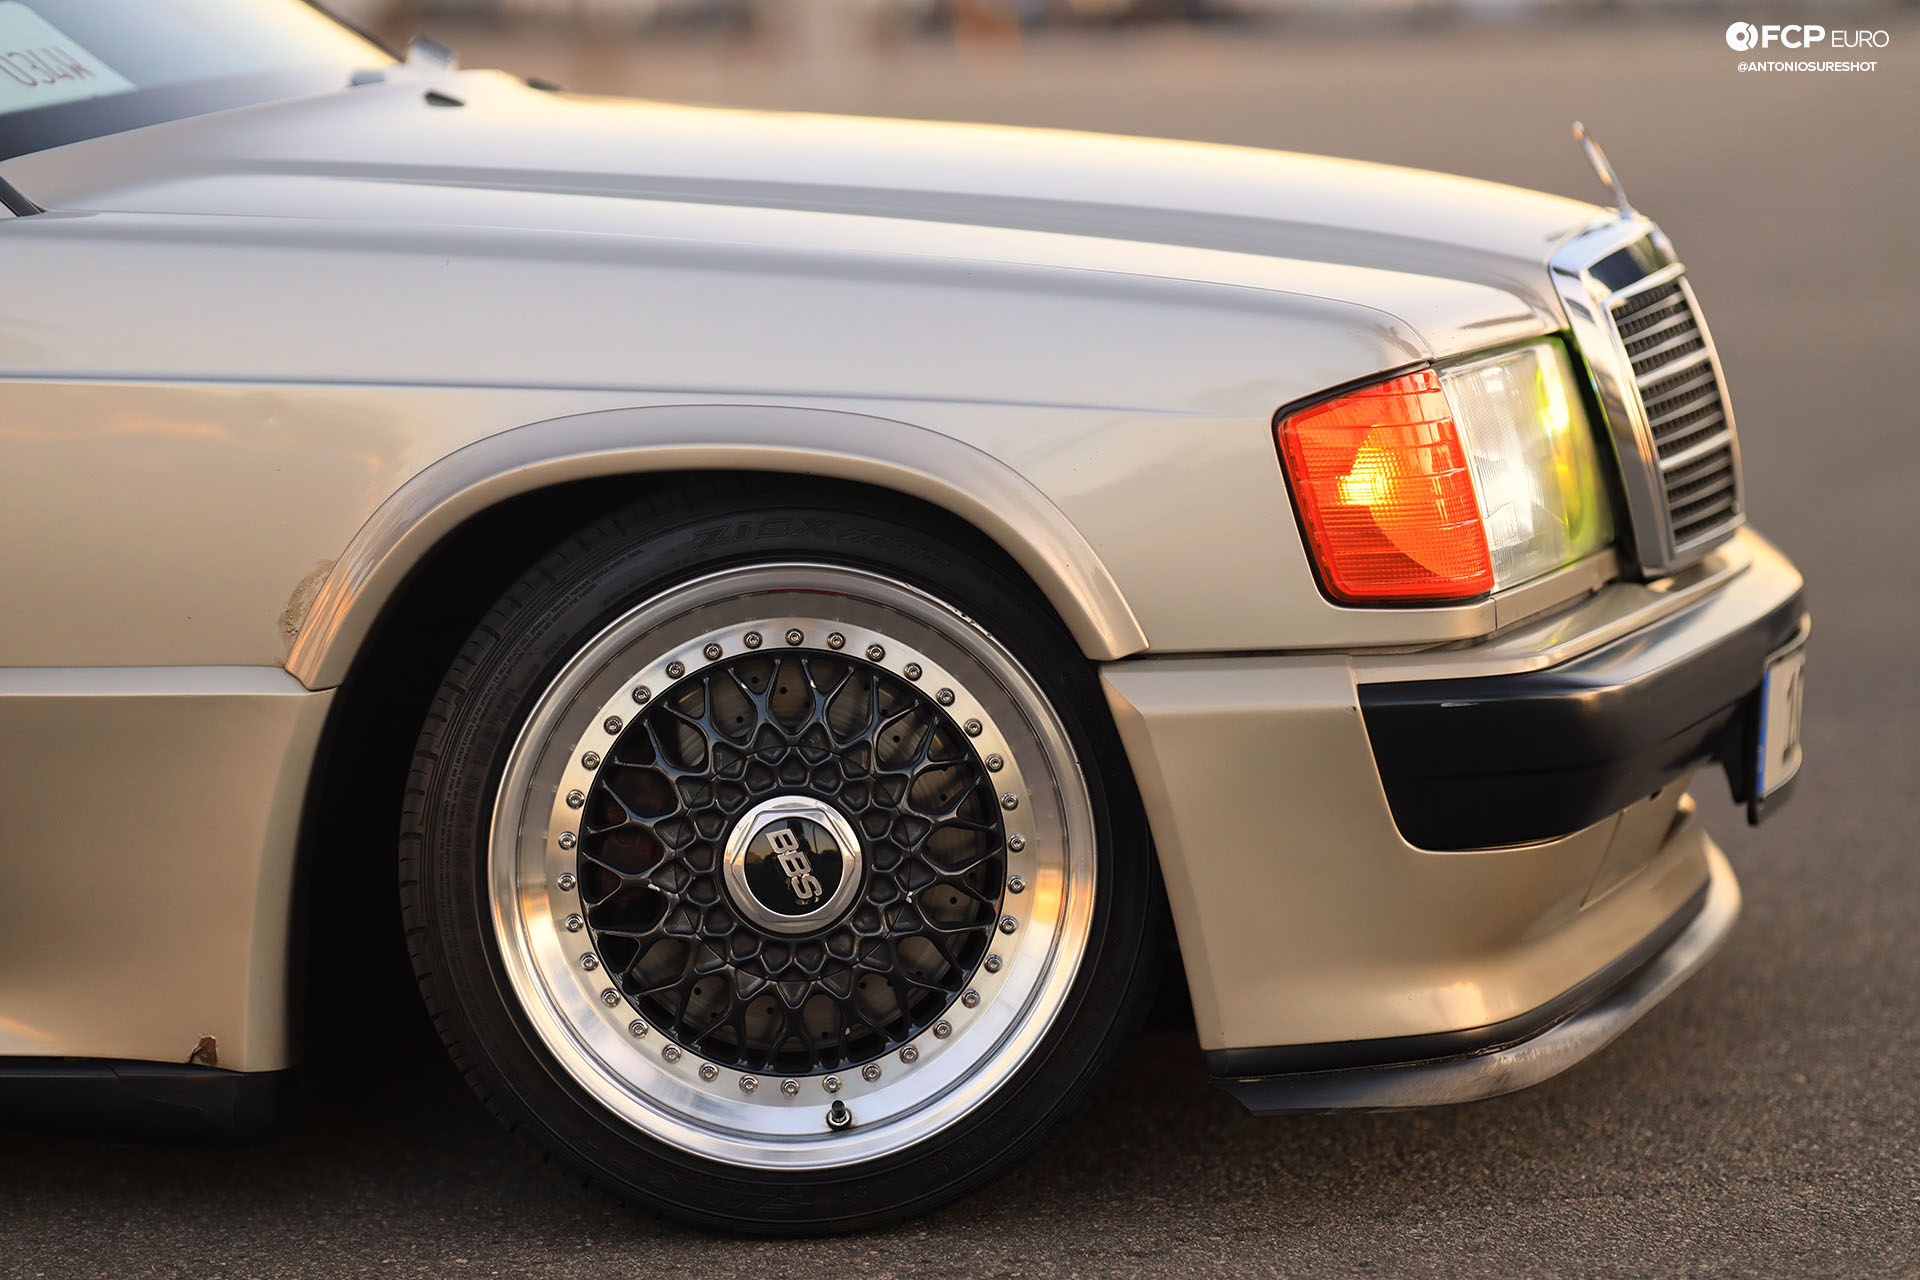 Mercedes Benz 190E 2.3 16v Cosworth EOSR1552